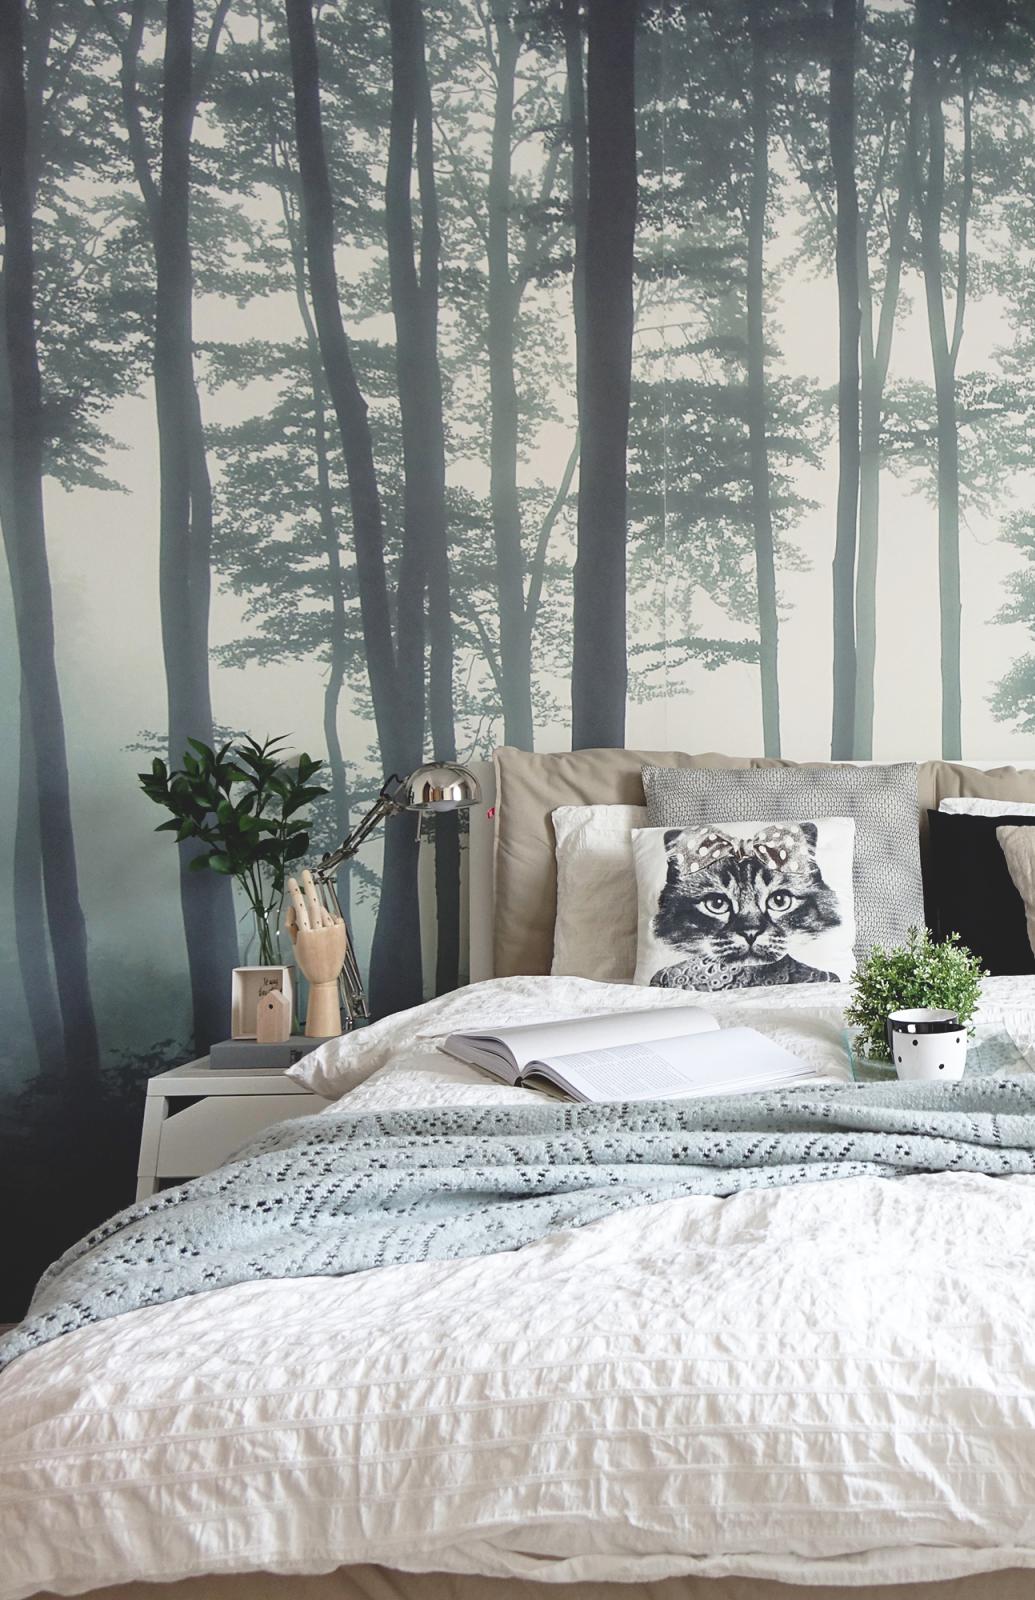 Sea Of Trees Forest Mural Wallpaper Muralswallpaper Forest